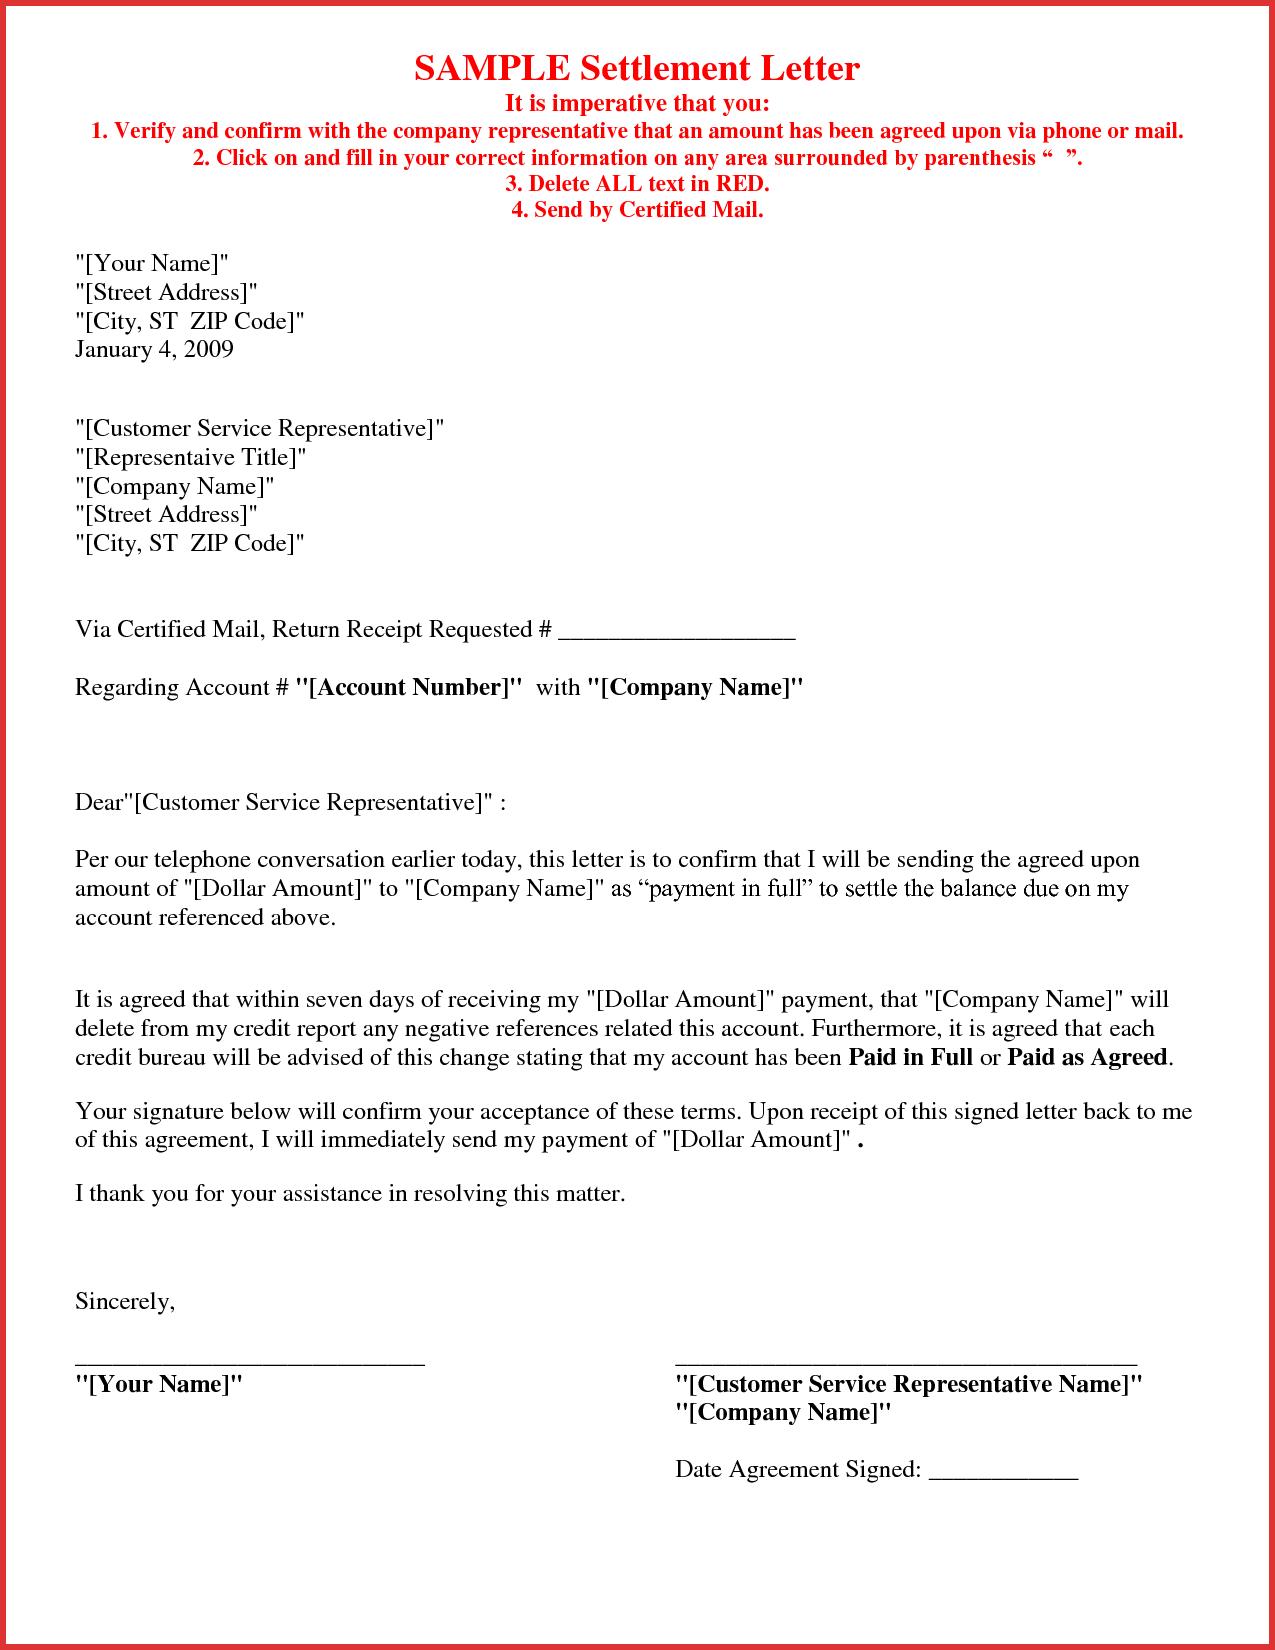 Debt Settlement Agreement Letter Template Collection  Letter Templates For Settlement Agreement Letter Template